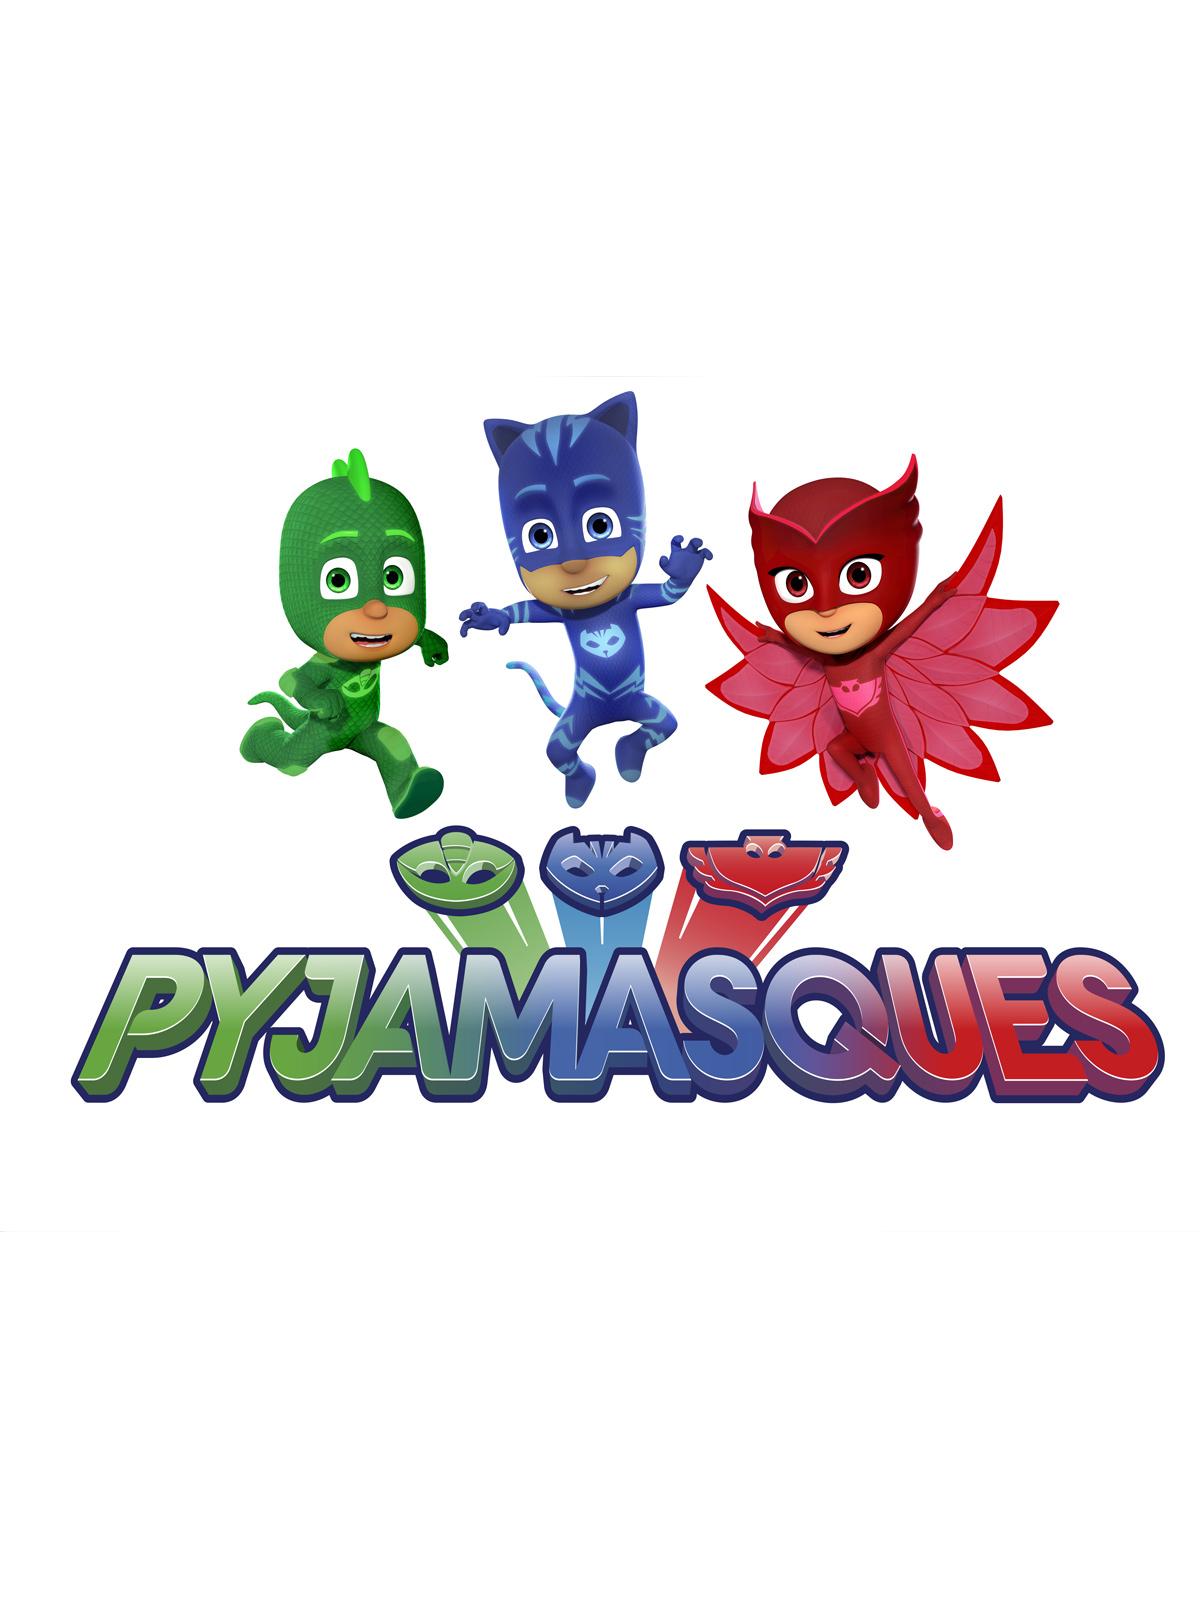 les pyjamasques saison 1 allocin u00e9 game of thrones crown clipart game of thrones clip art sword chair